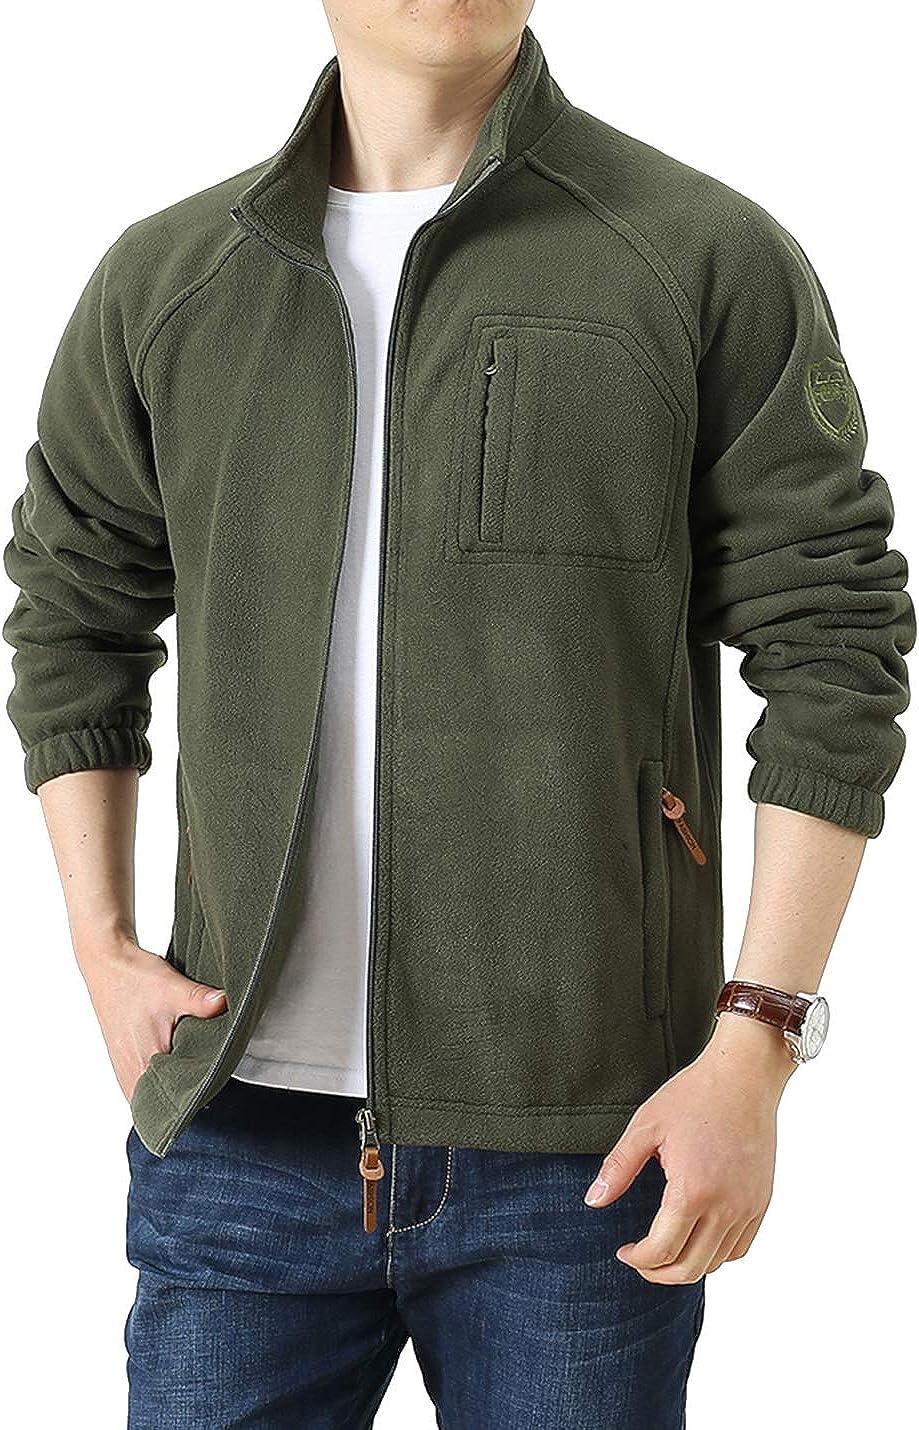 Locachy overseas Men's Full-Zip Brand Cheap Sale Venue Fleece Jacket Lightweight Outdo Windproof